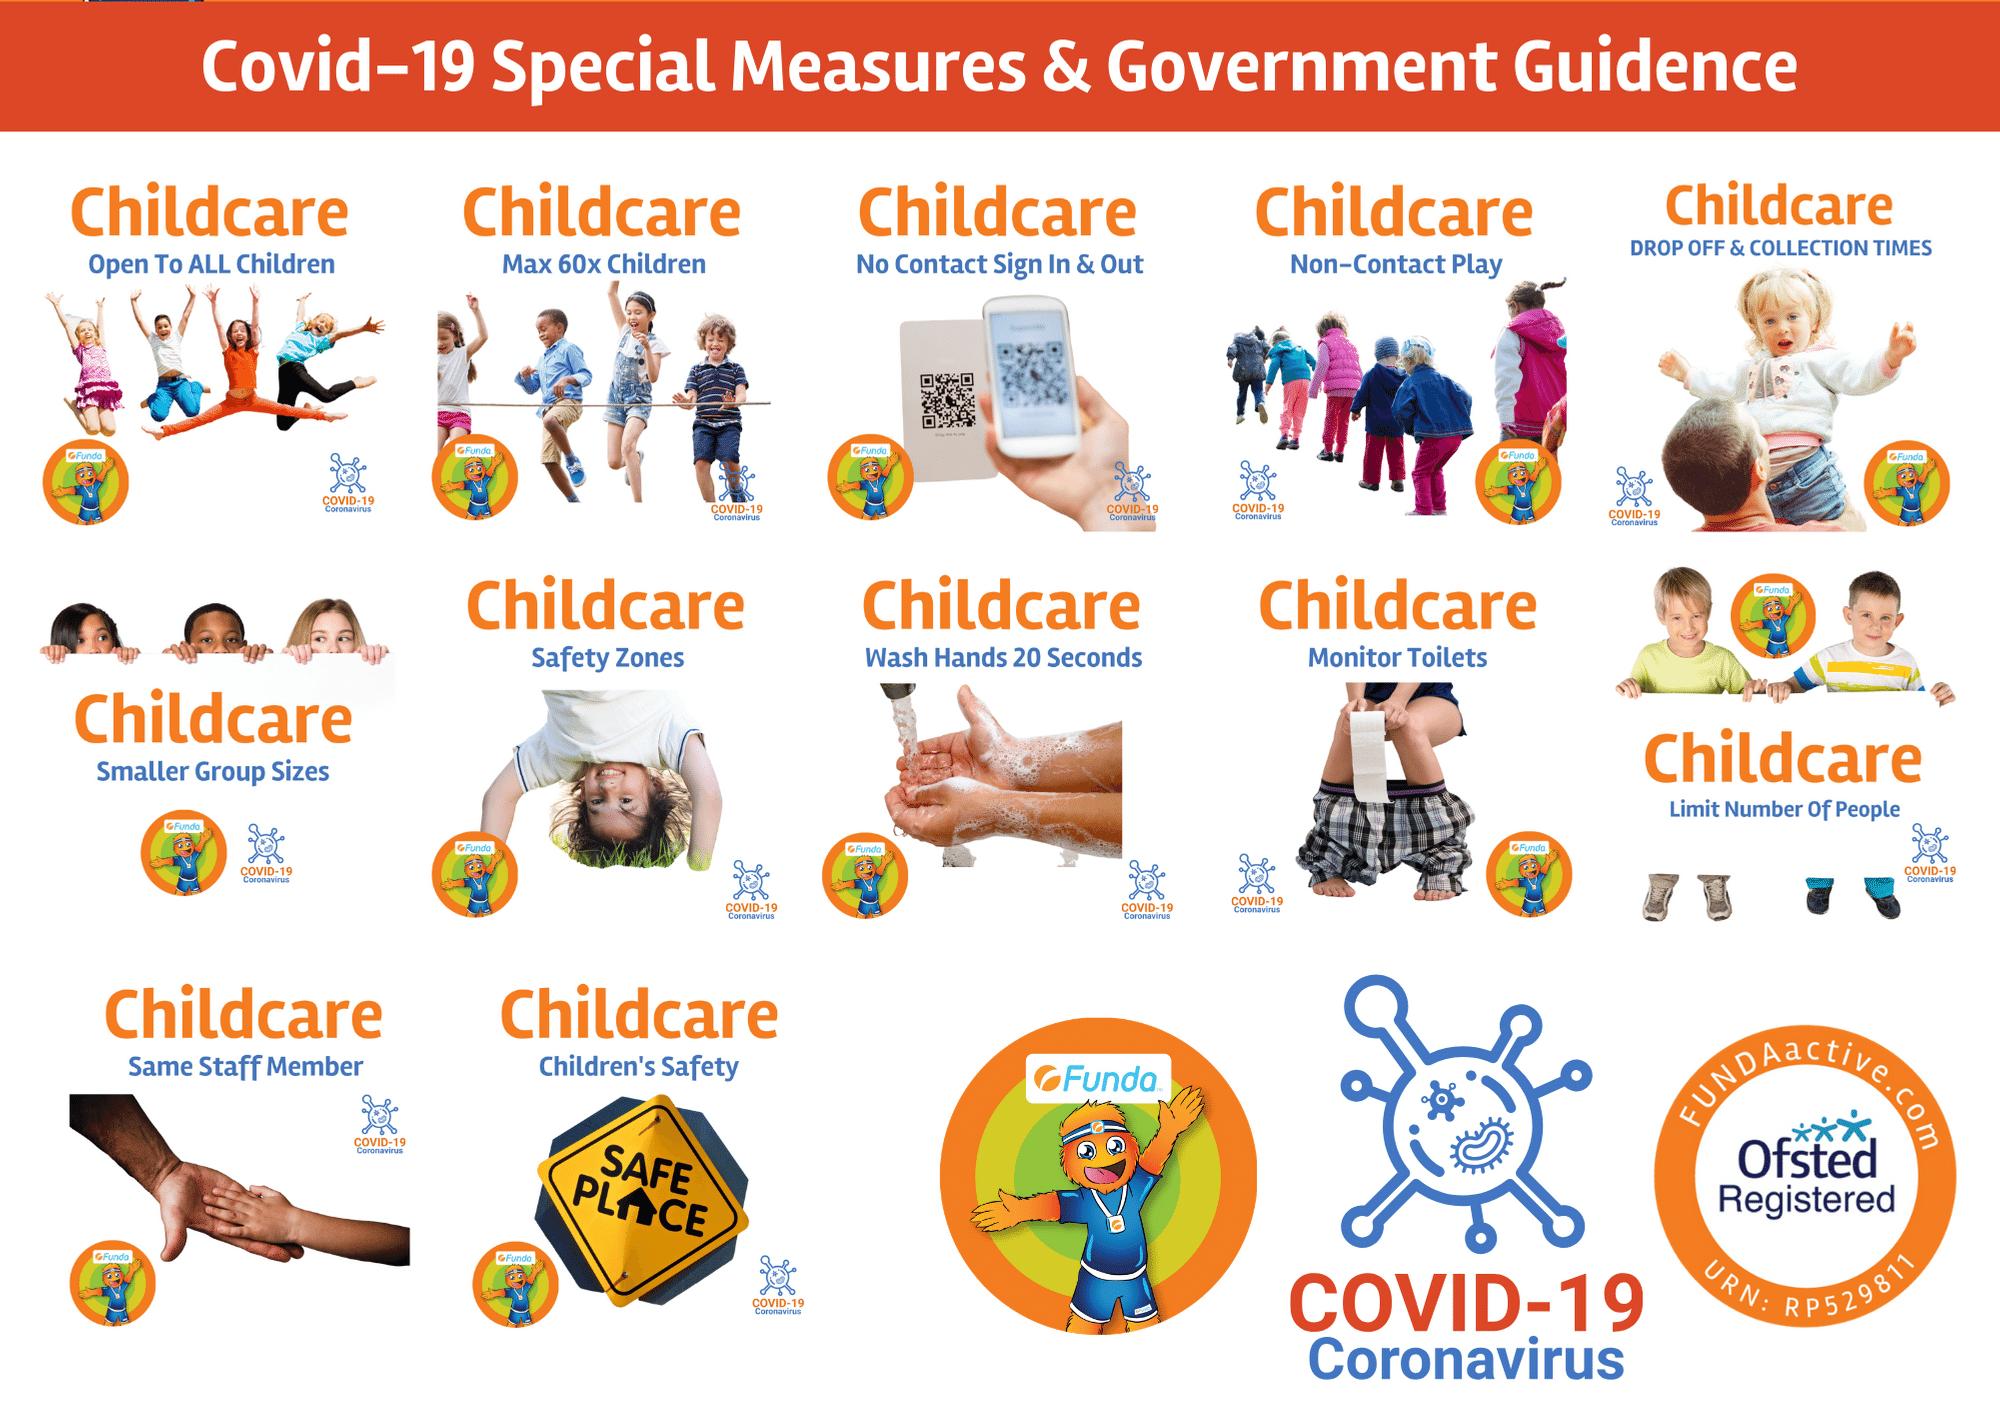 Covid-19 Childcare Measures FUNDA